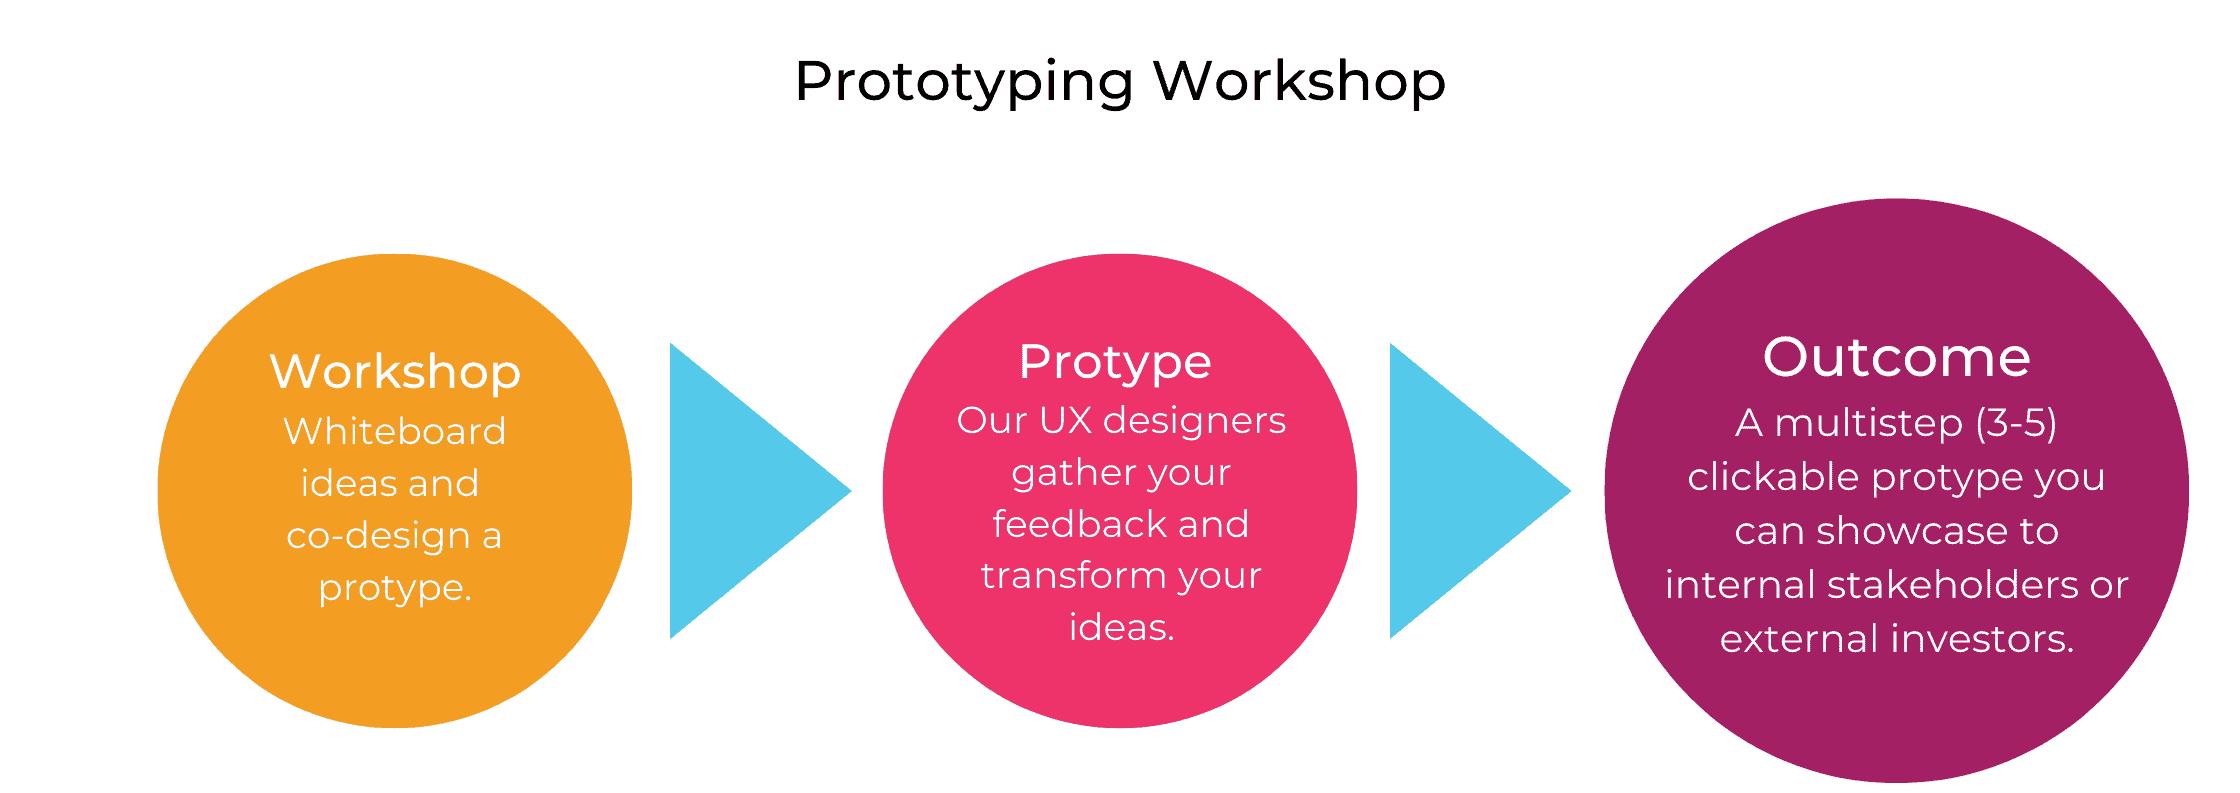 Prototyping Workshop